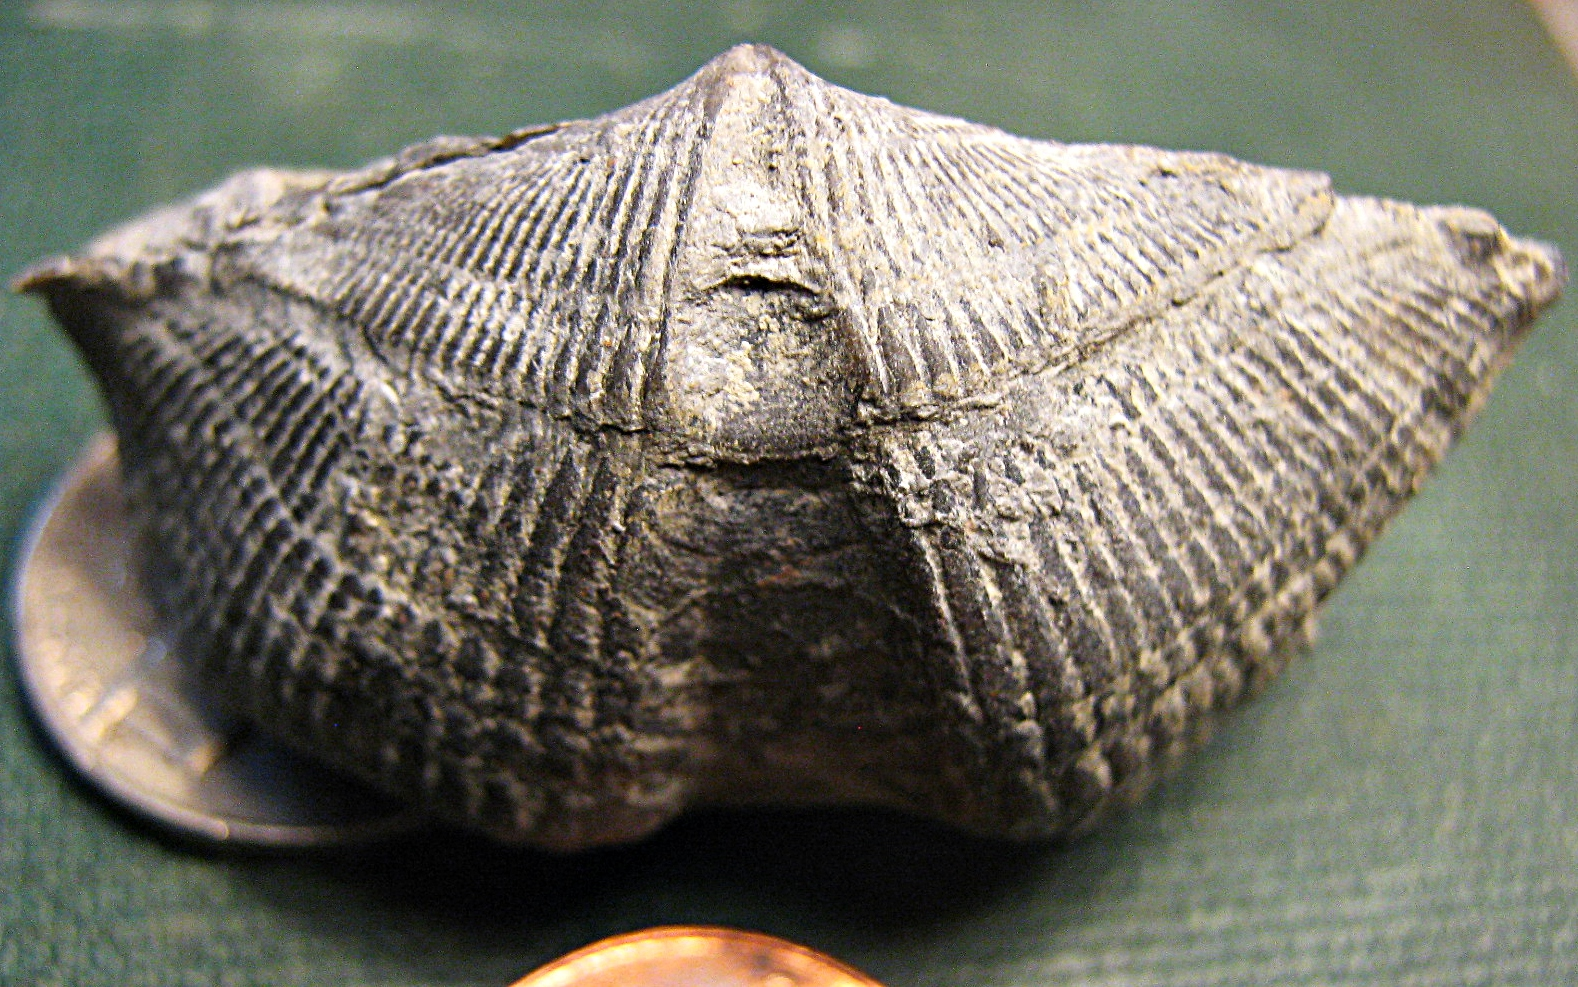 Mediospirifer audaculus (brachiopod)